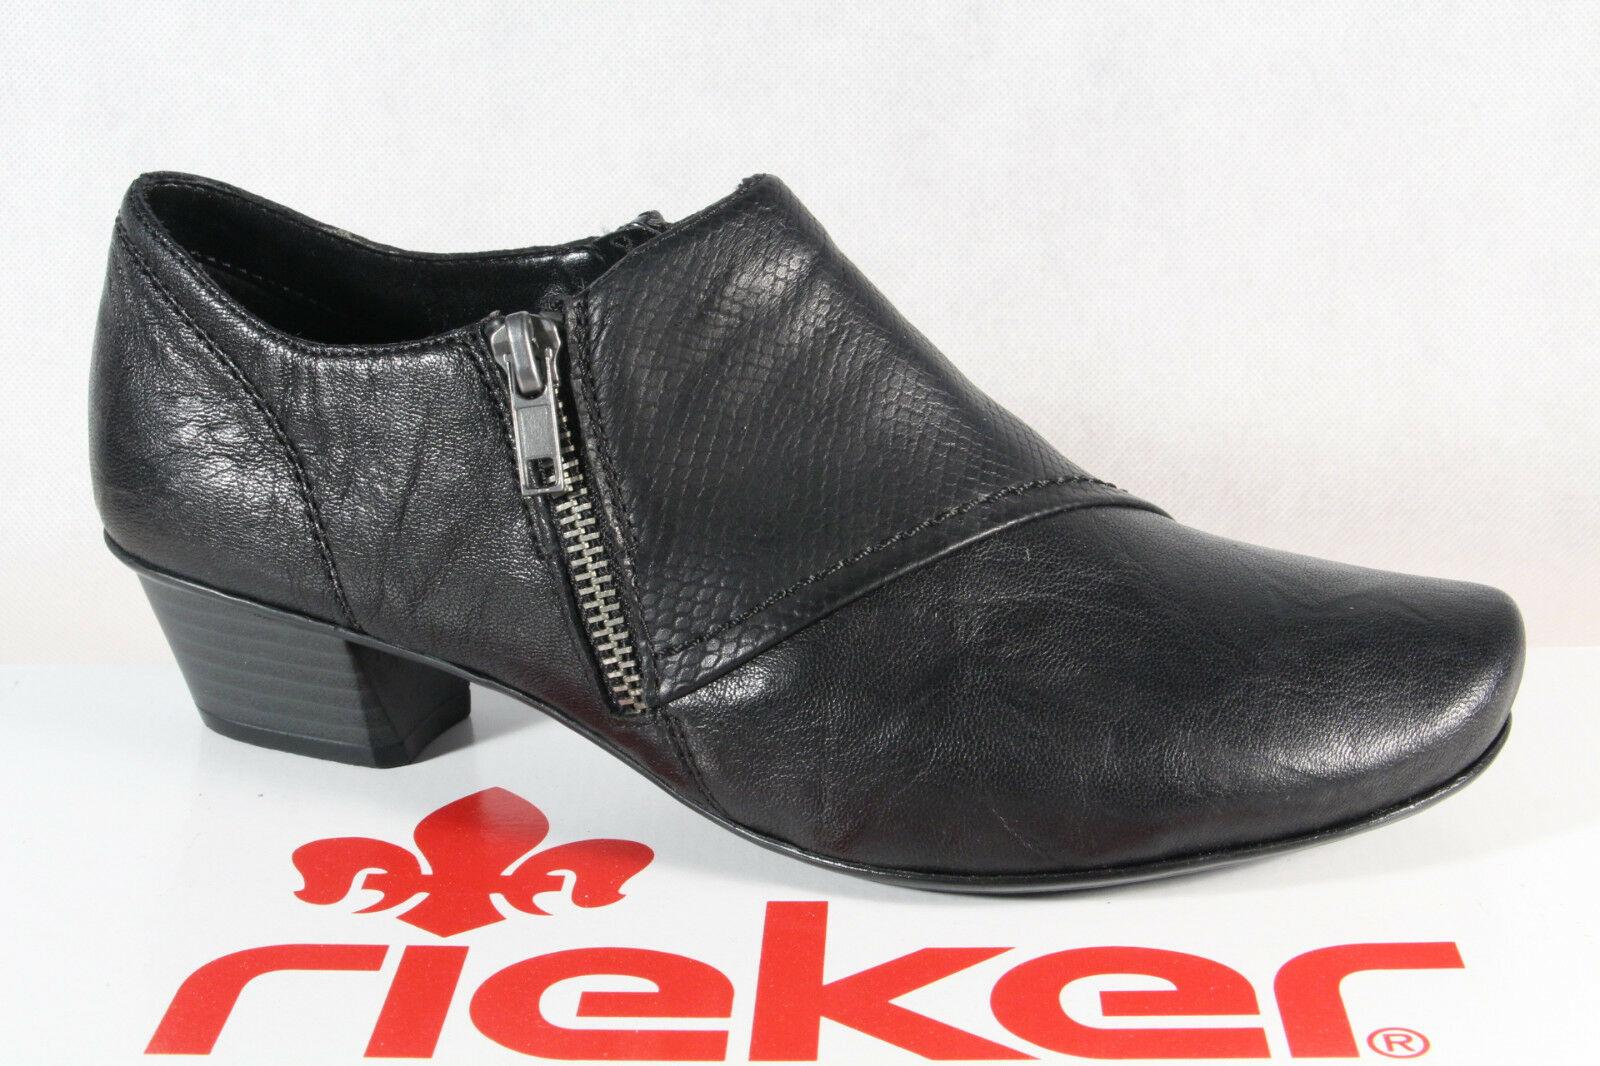 Rieker Damen Slipper Halbschuhe, Sneakers schwarz Echtleder